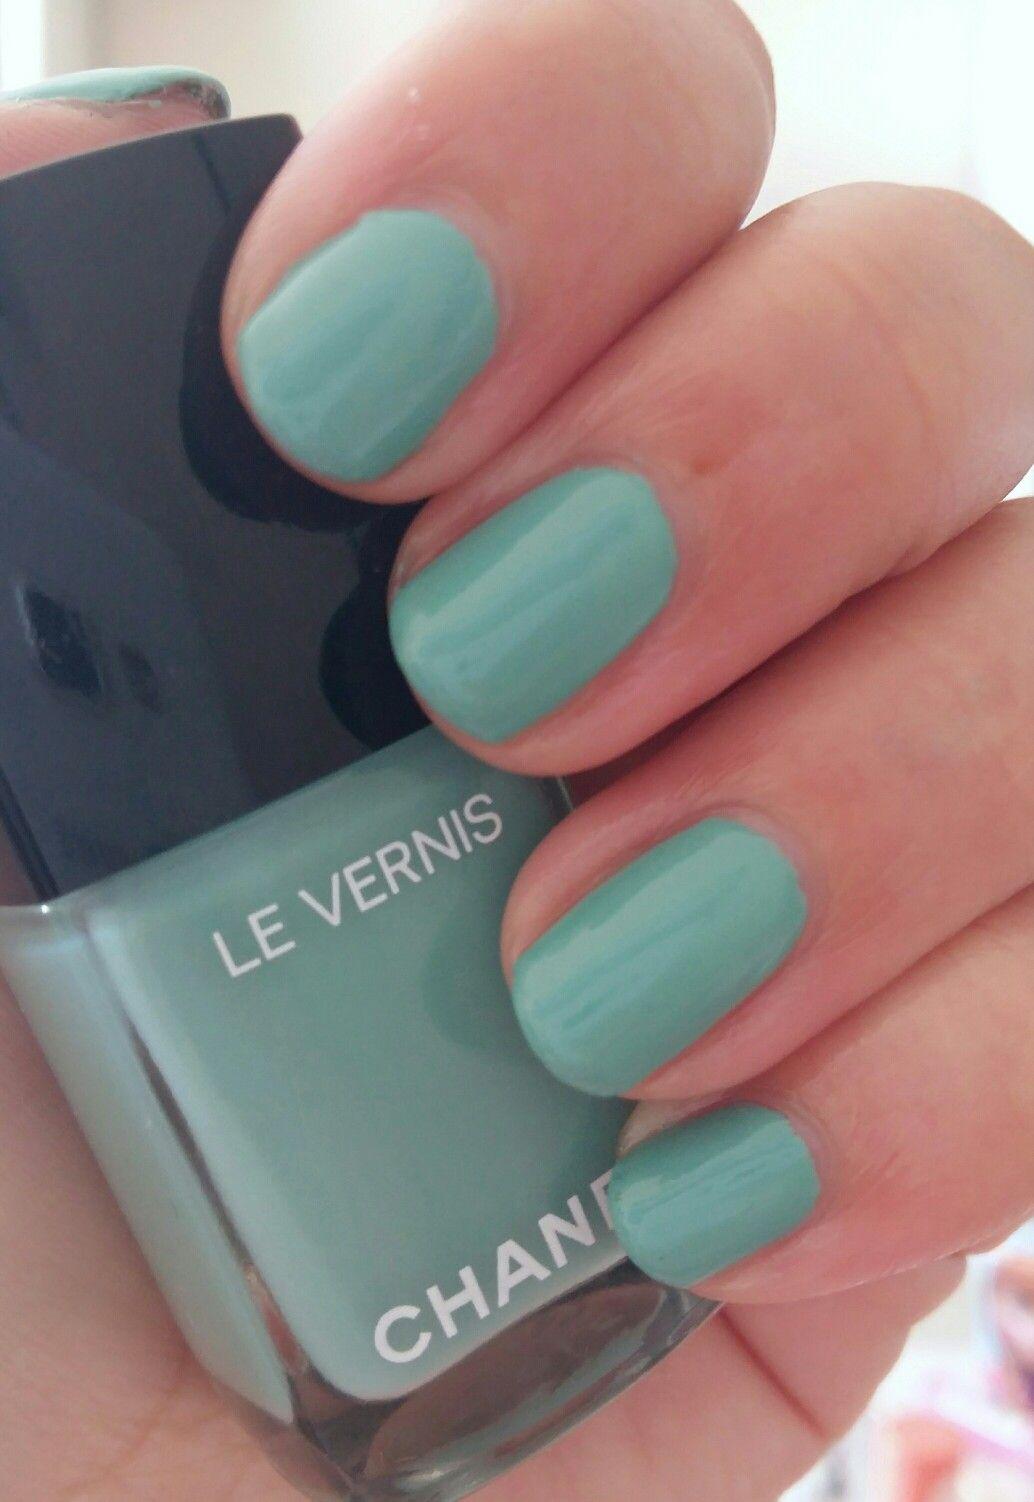 Chanel 590 Verde Pastello Nail Polish Nails Beauty